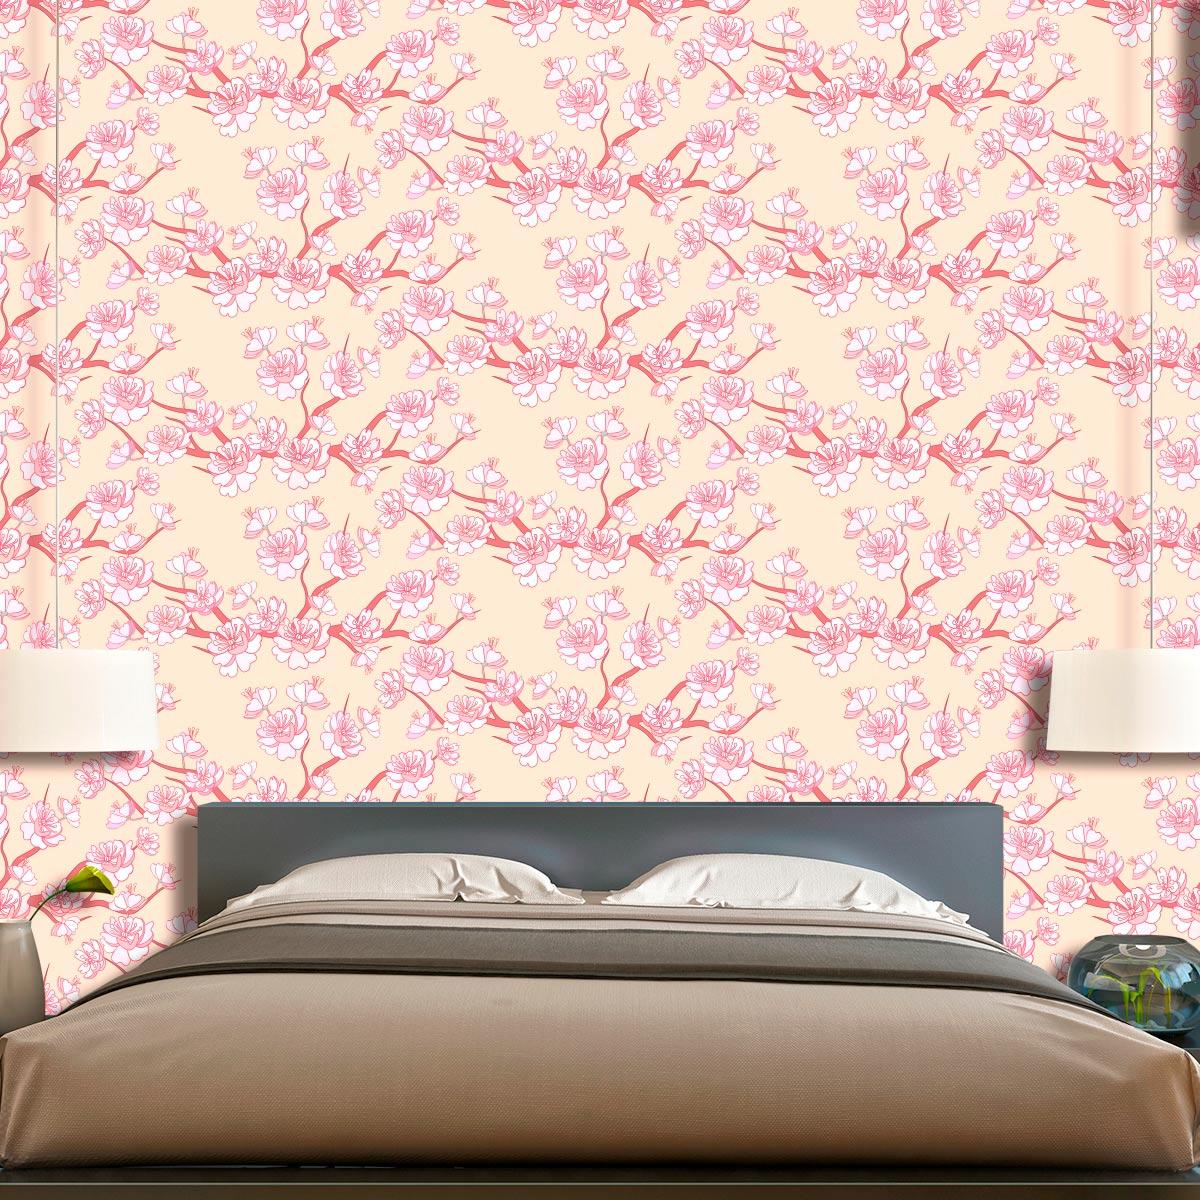 Papel de Parede Floral Galhos Flores Rose Glamour Adesivo